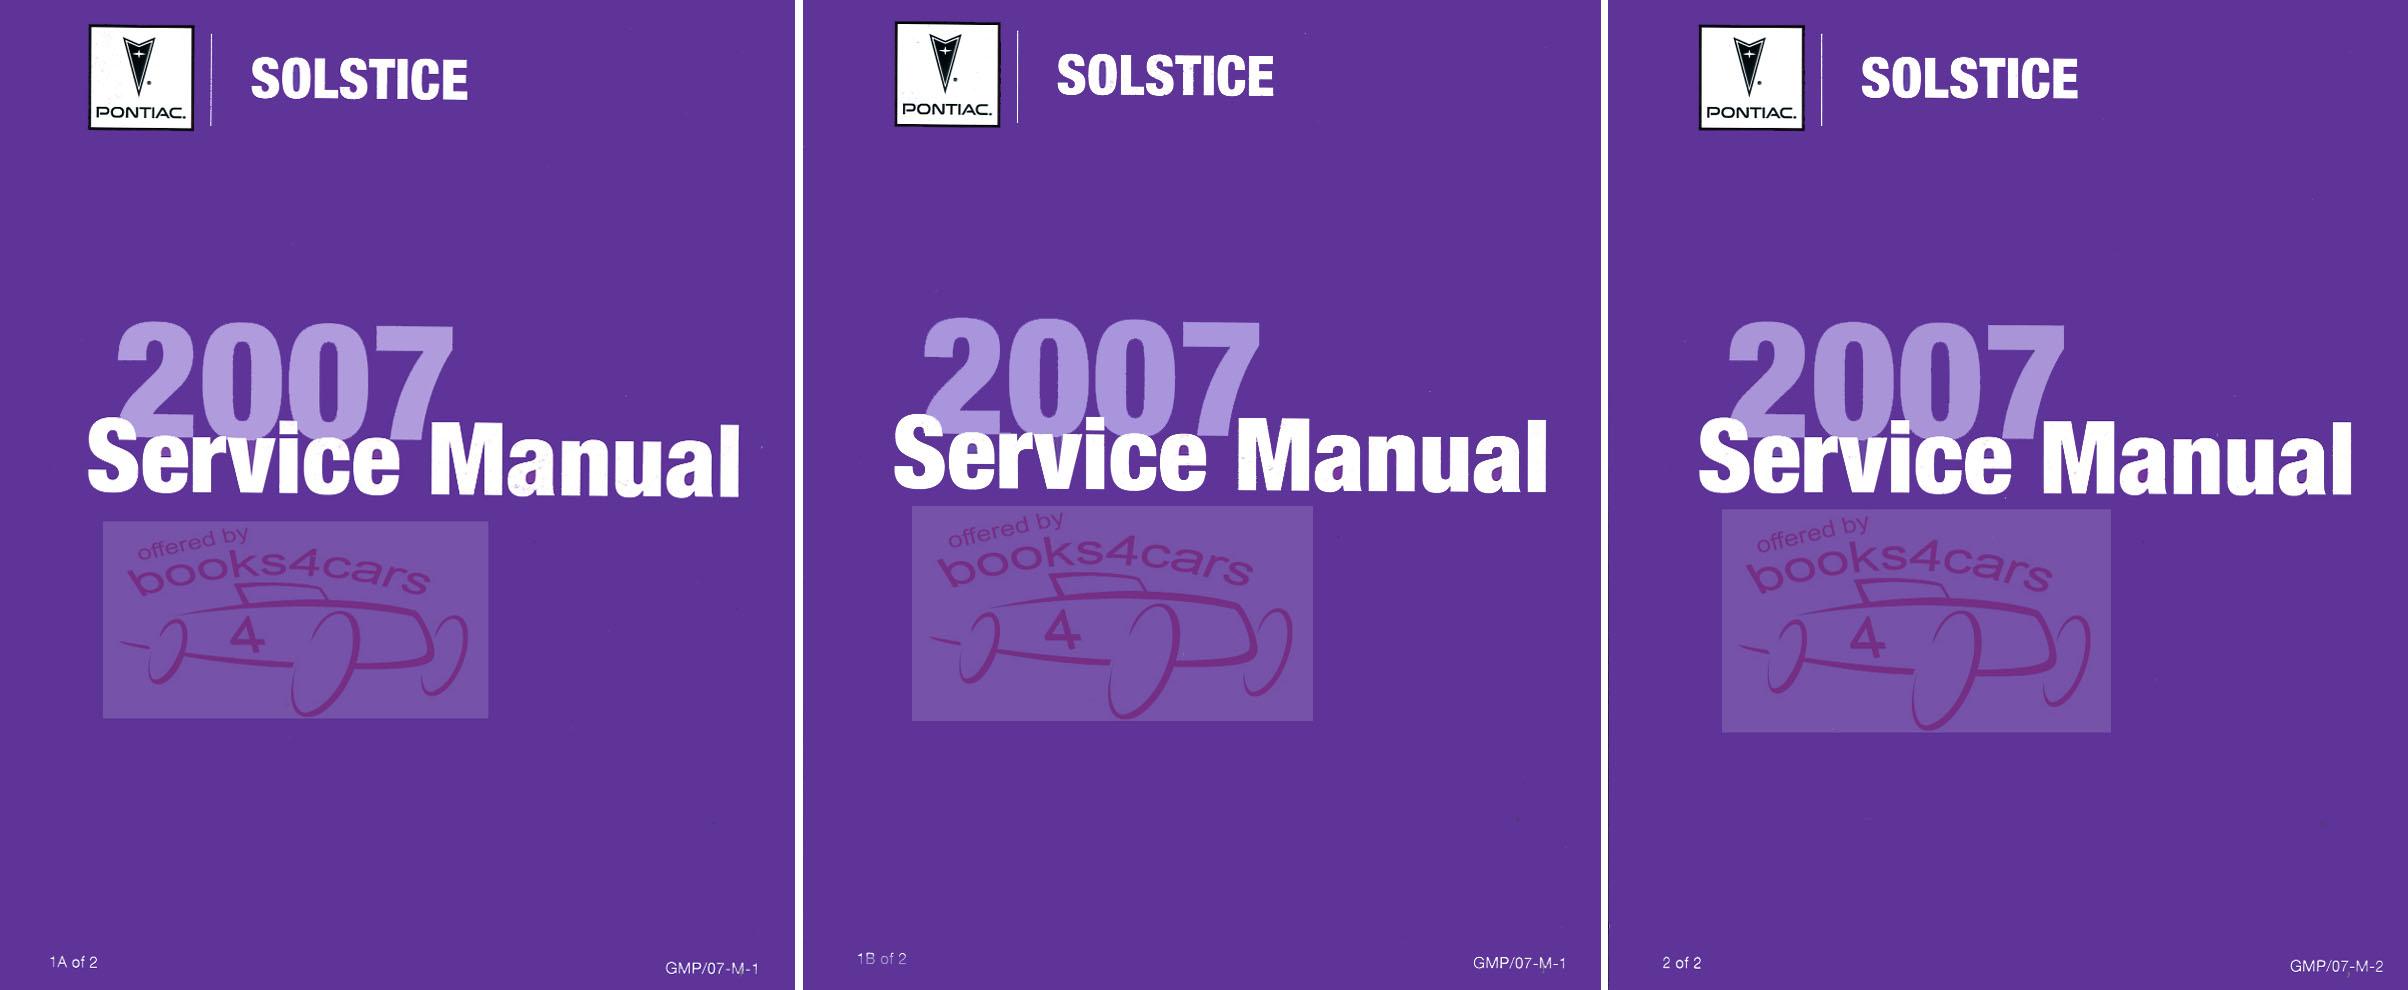 shop service solstice repair manual 2007 pontiac set factory gm rh ebay com Service ManualsOnline Repair Manuals